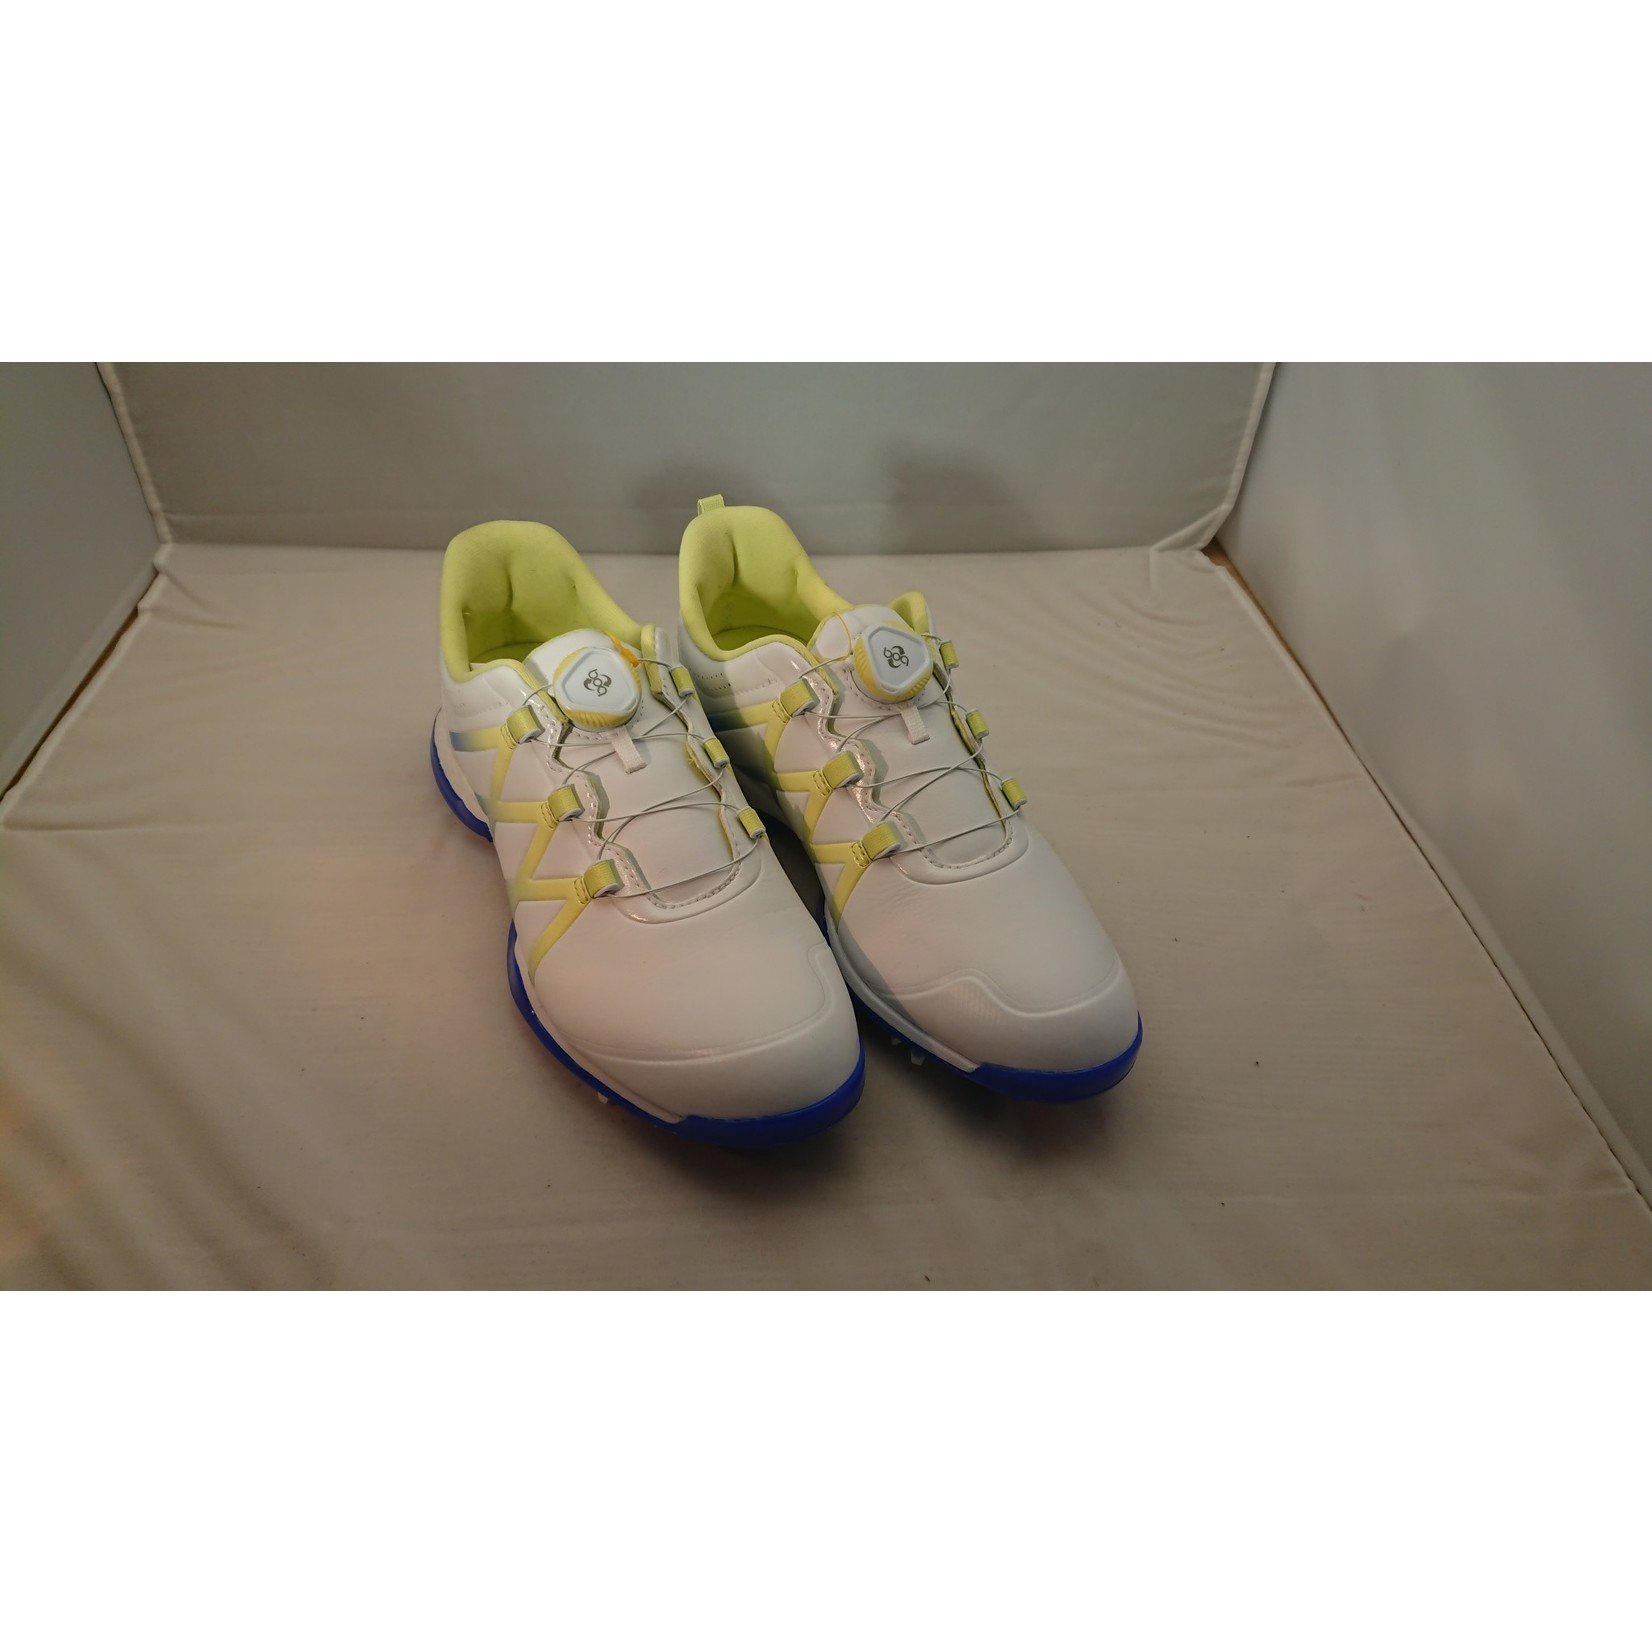 Adidas Adidas W Adipwr boost Boa Wit 40 / UK6,5